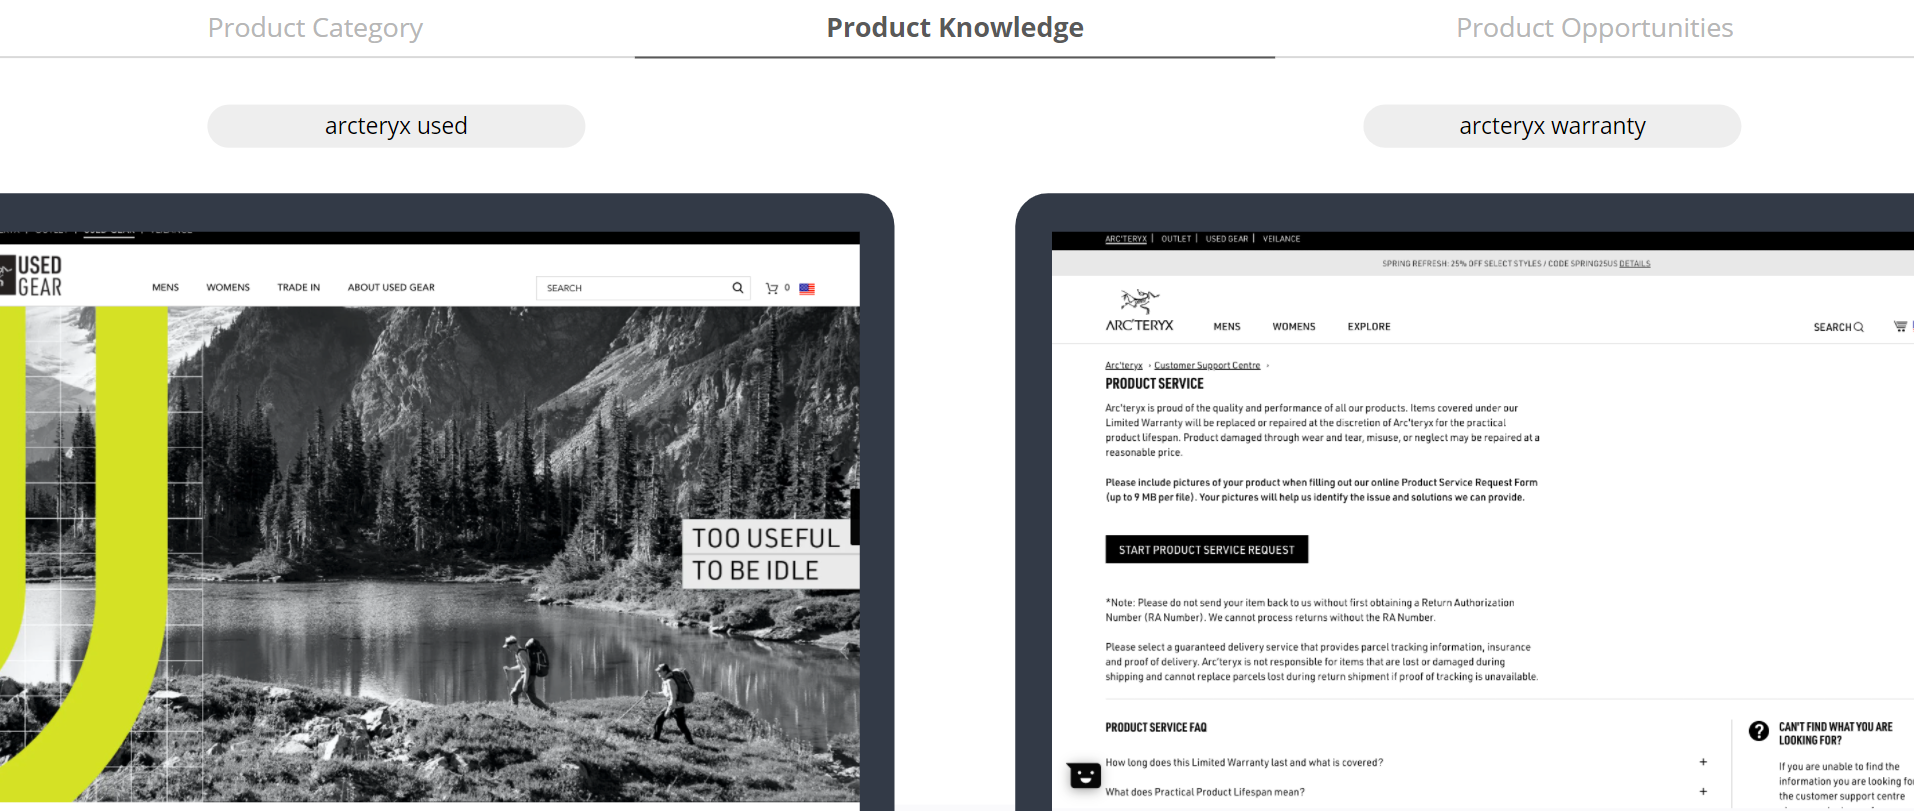 Arcteryx - Product Knowledge